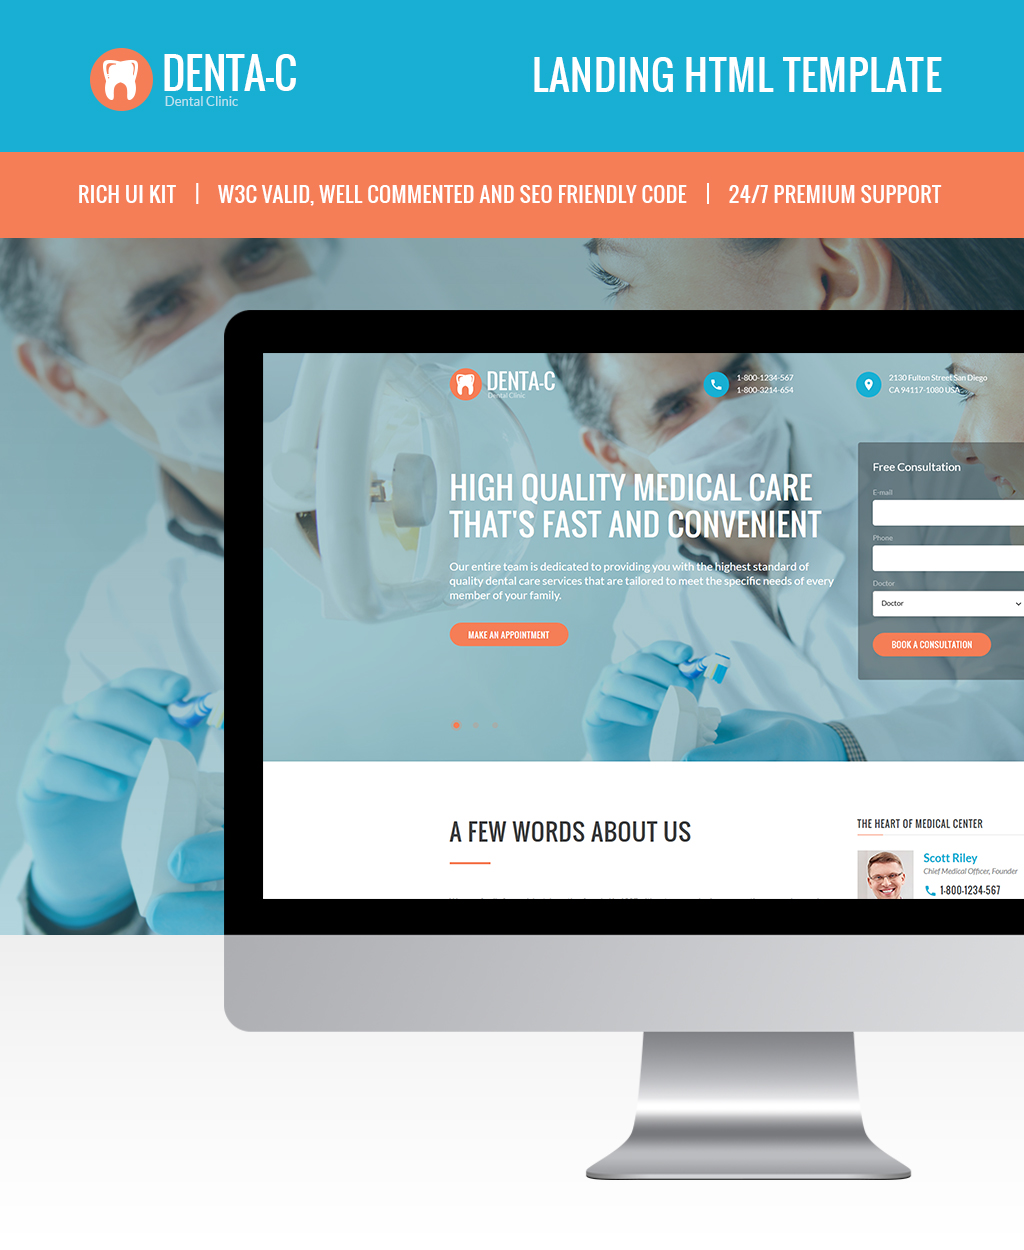 Denta-C Dental Clinic Landing Page Template